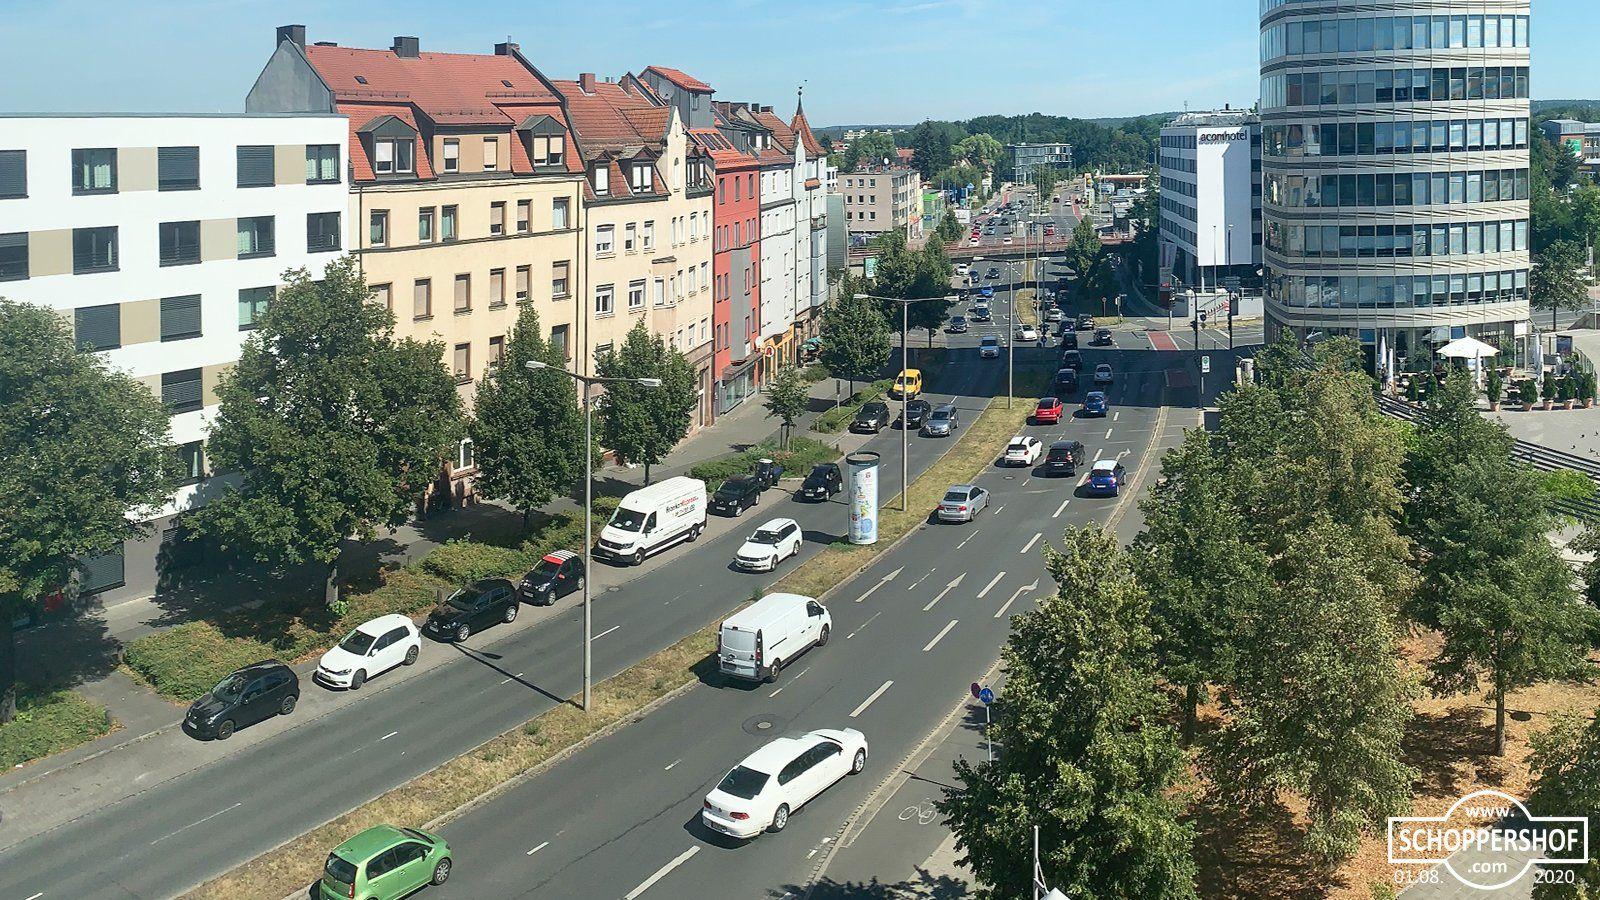 Nürnberg Bayreuther Straße